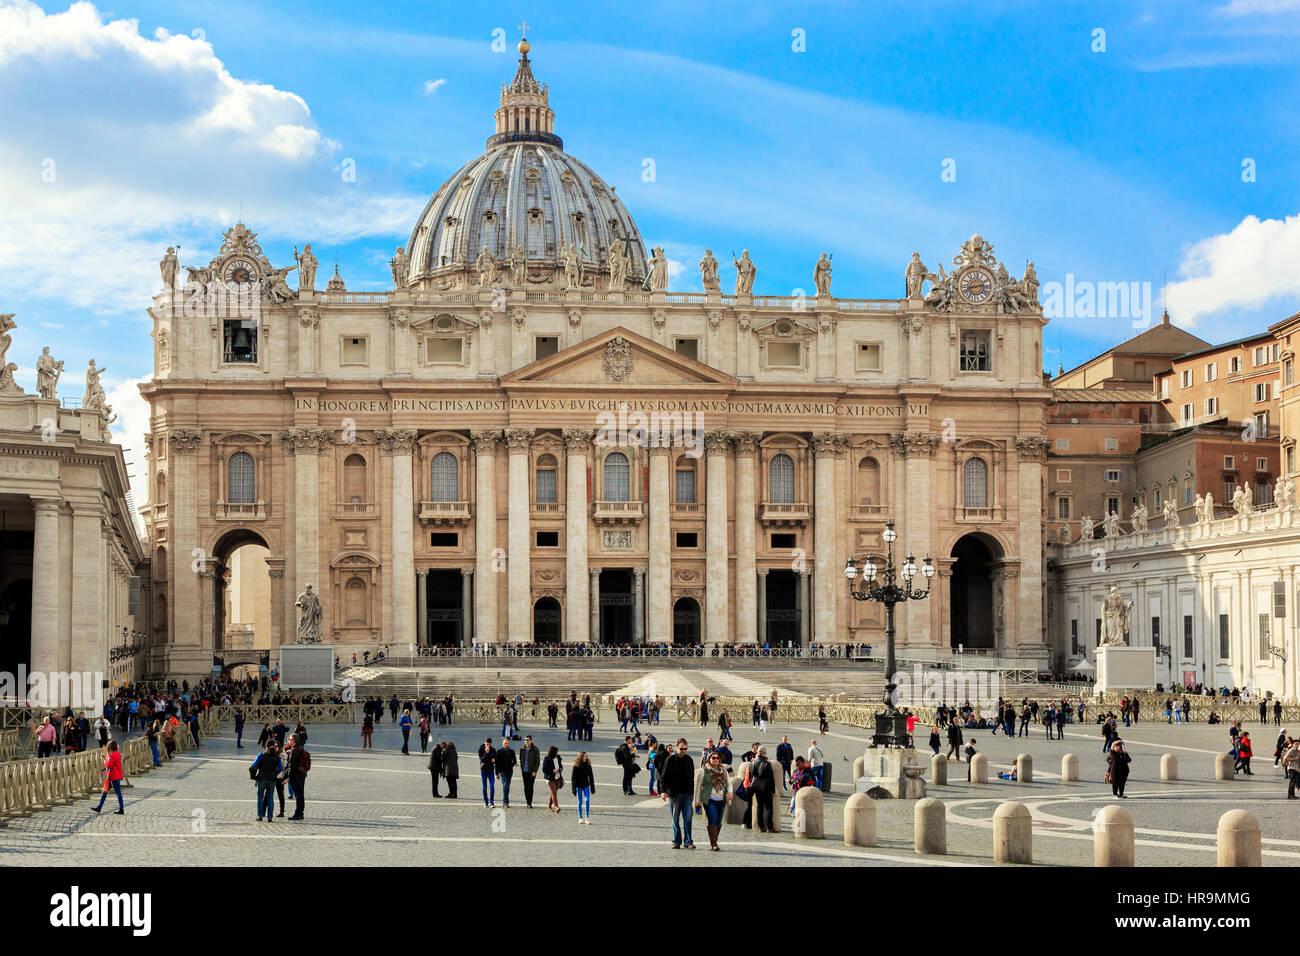 St. Peter's Basilica, Vatican City, Rome, Italy Stock Photo